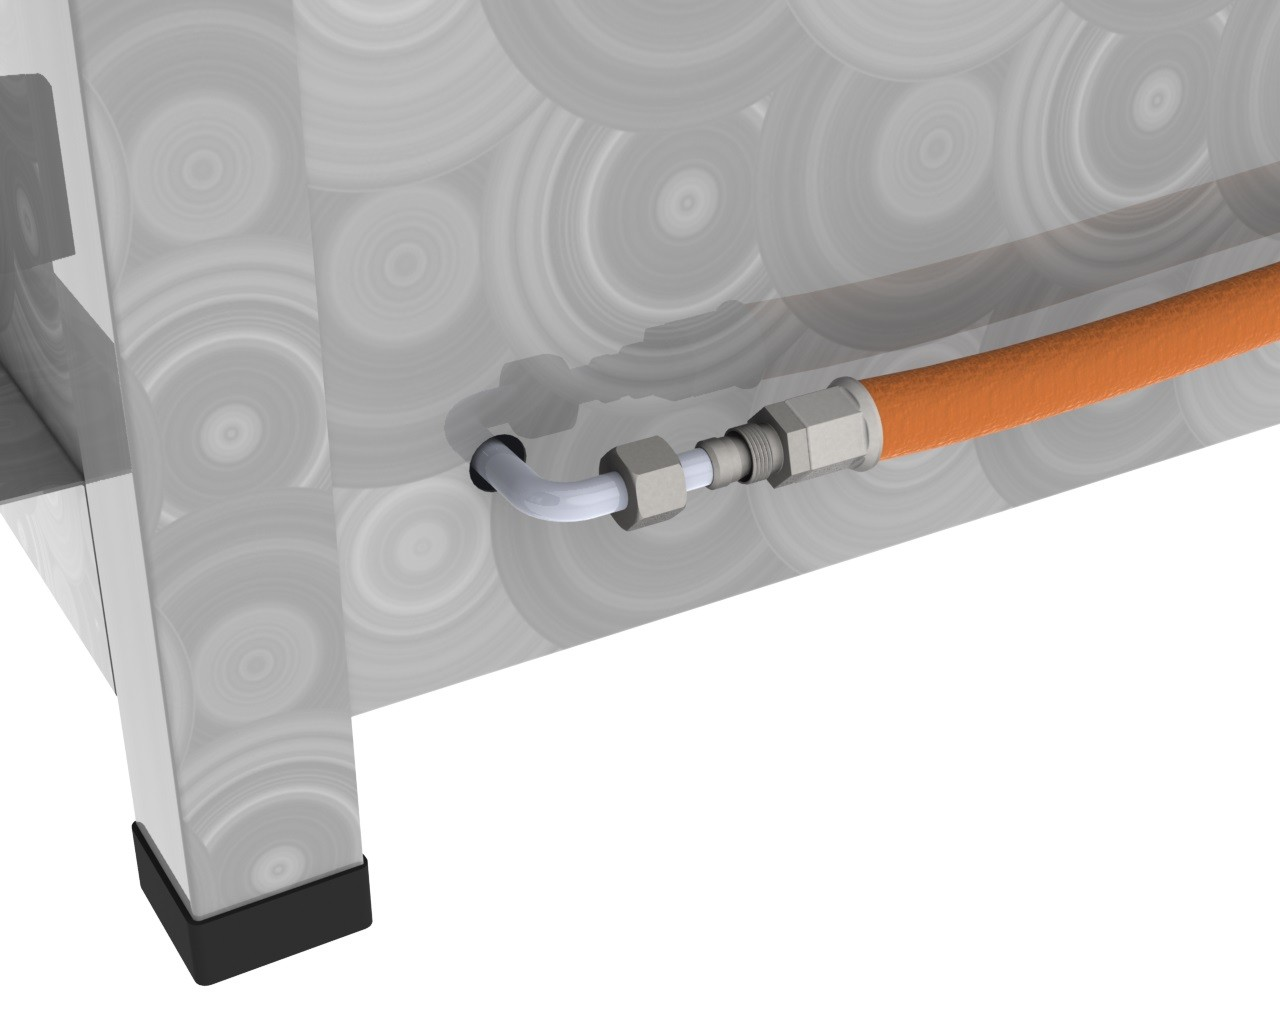 Gasbräter 3-flammig 13,5kW GB3FTRP2019030893